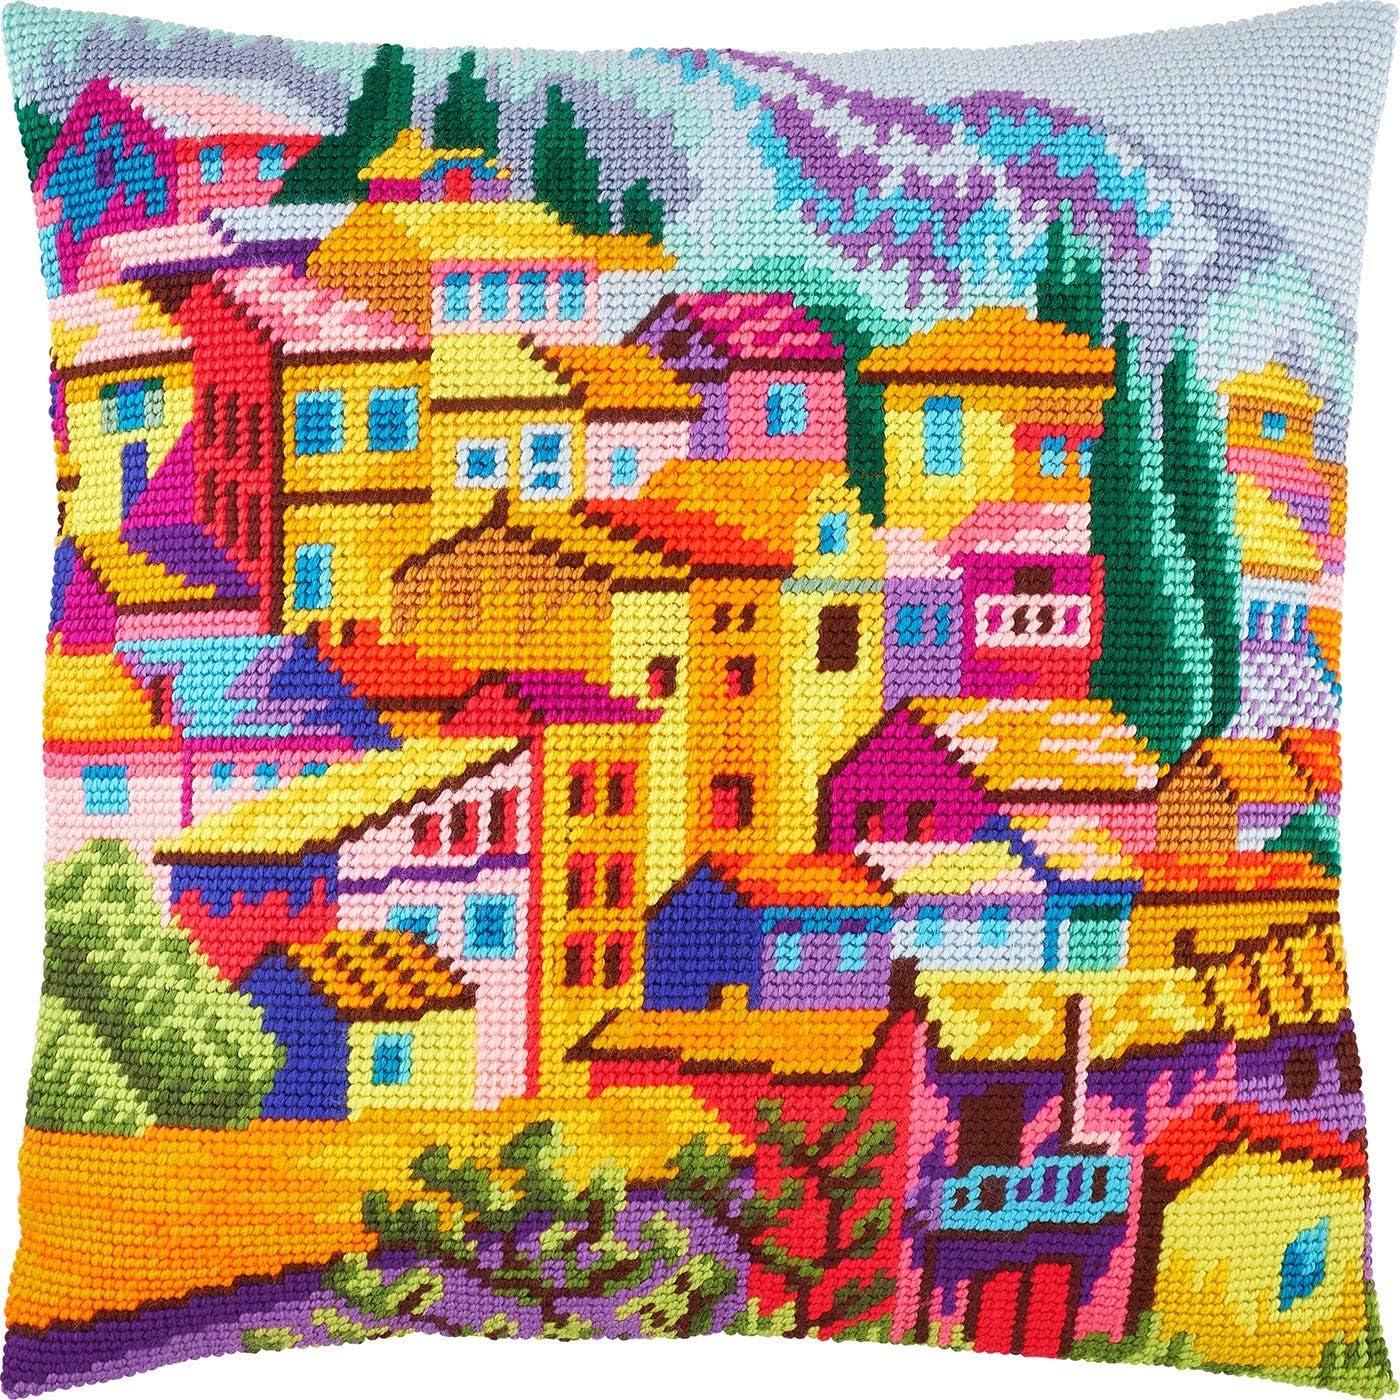 montenegro needlepoint kit throw pillow 16 16 inches printed tapestry canvas european quality